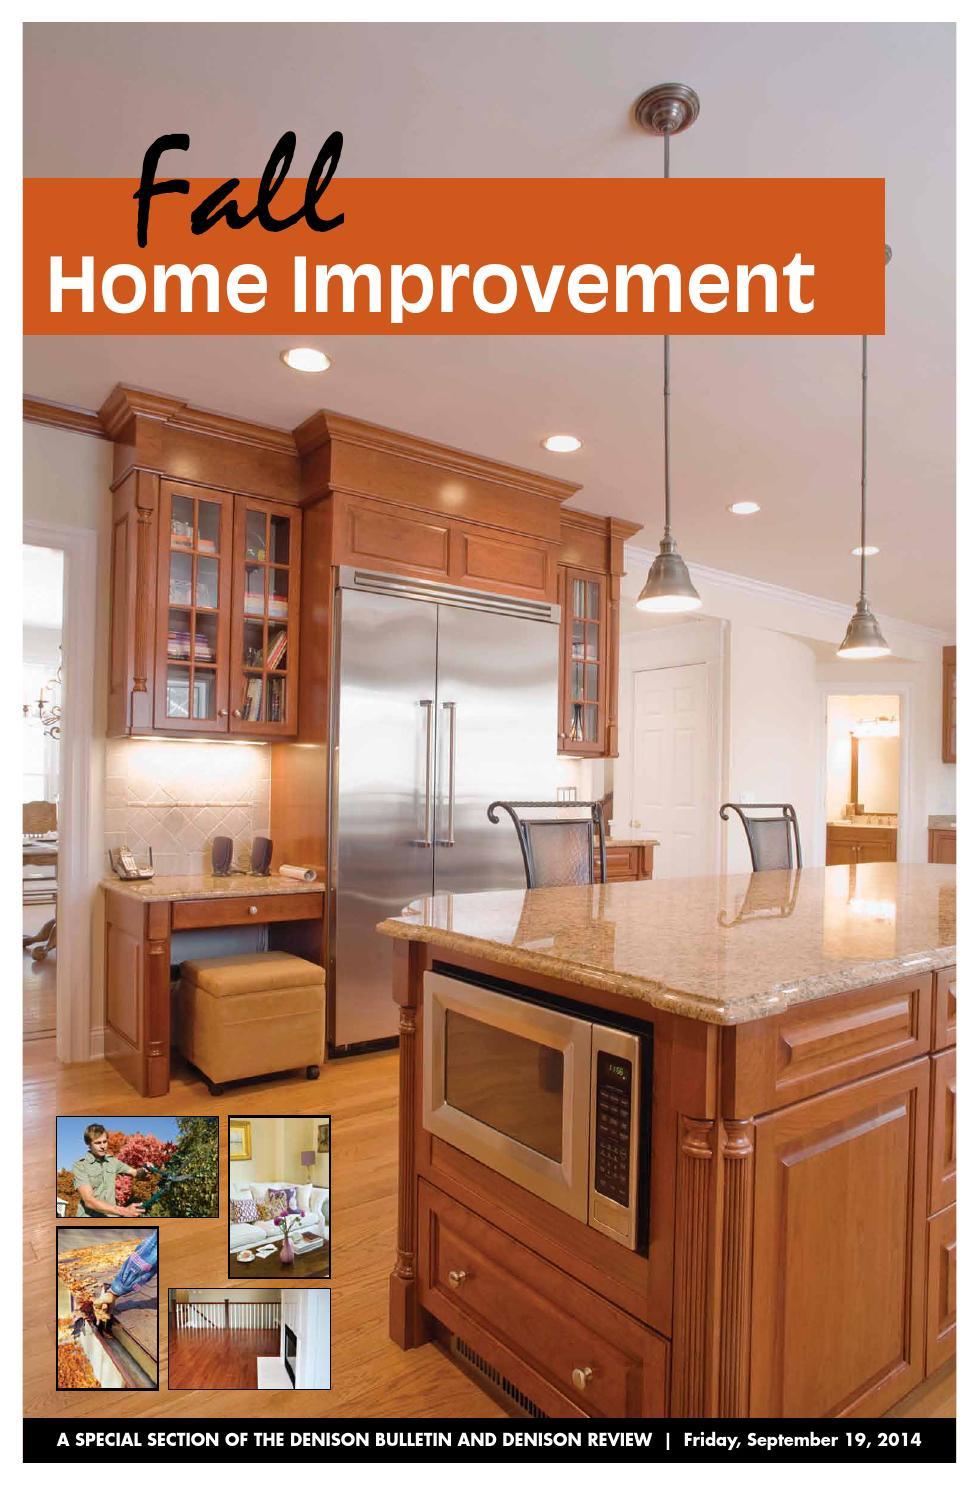 walsh hardwood flooring reviews of dbr fall home improvement by southwestiowanews com issuu regarding page 1